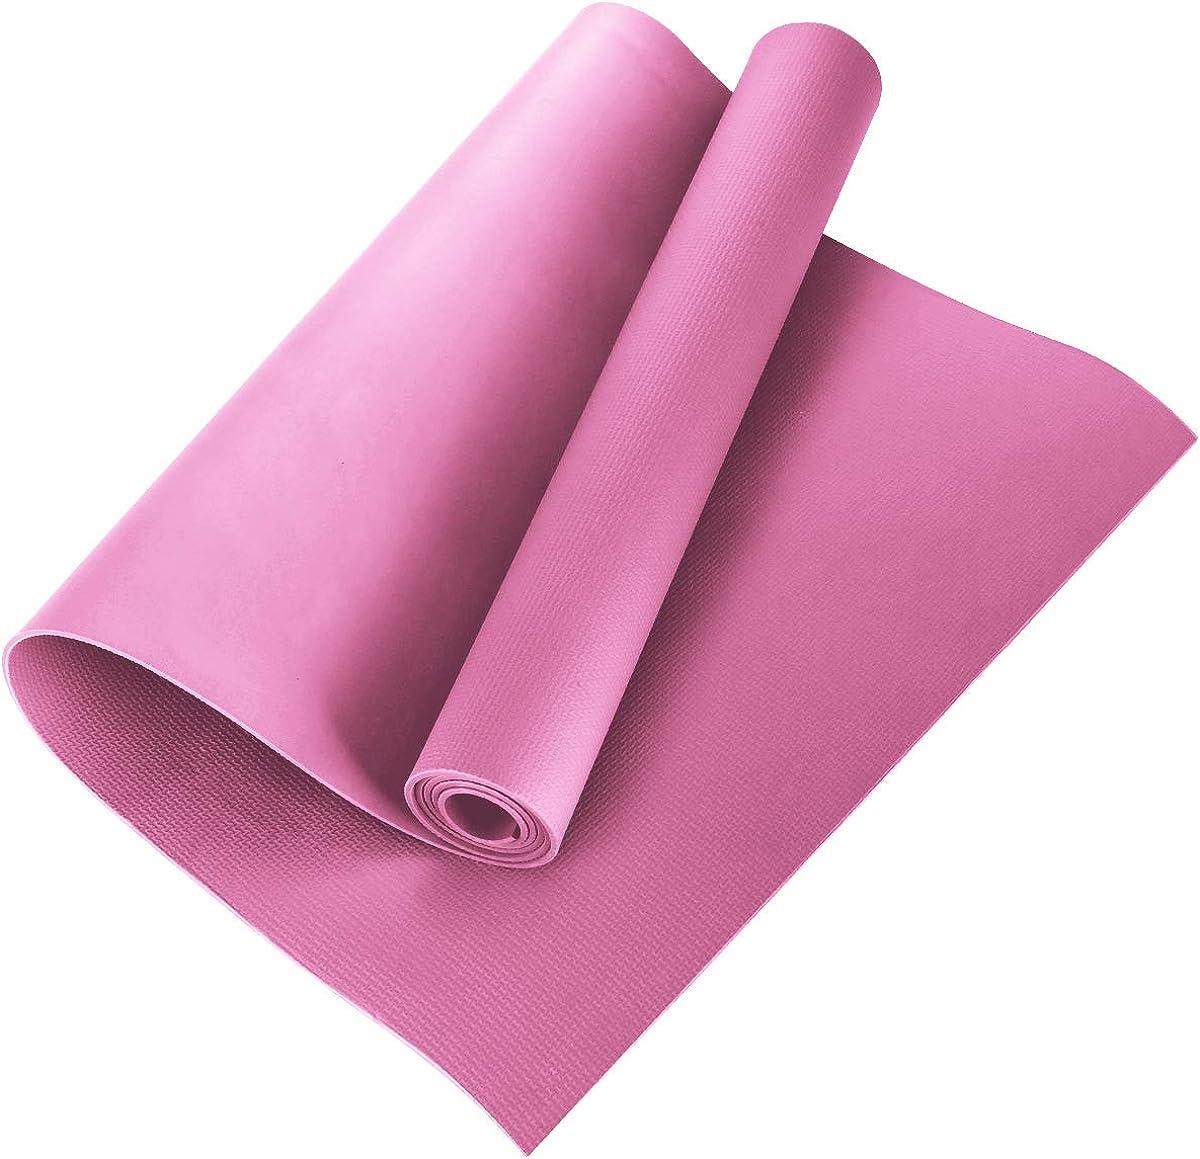 Tmtop Yoga Mat EVA Non-Slip Fitness Pad Workout Exercise Gym Mat Pilates Meditation Accessory Tool 173 * 60 * 0.4cm